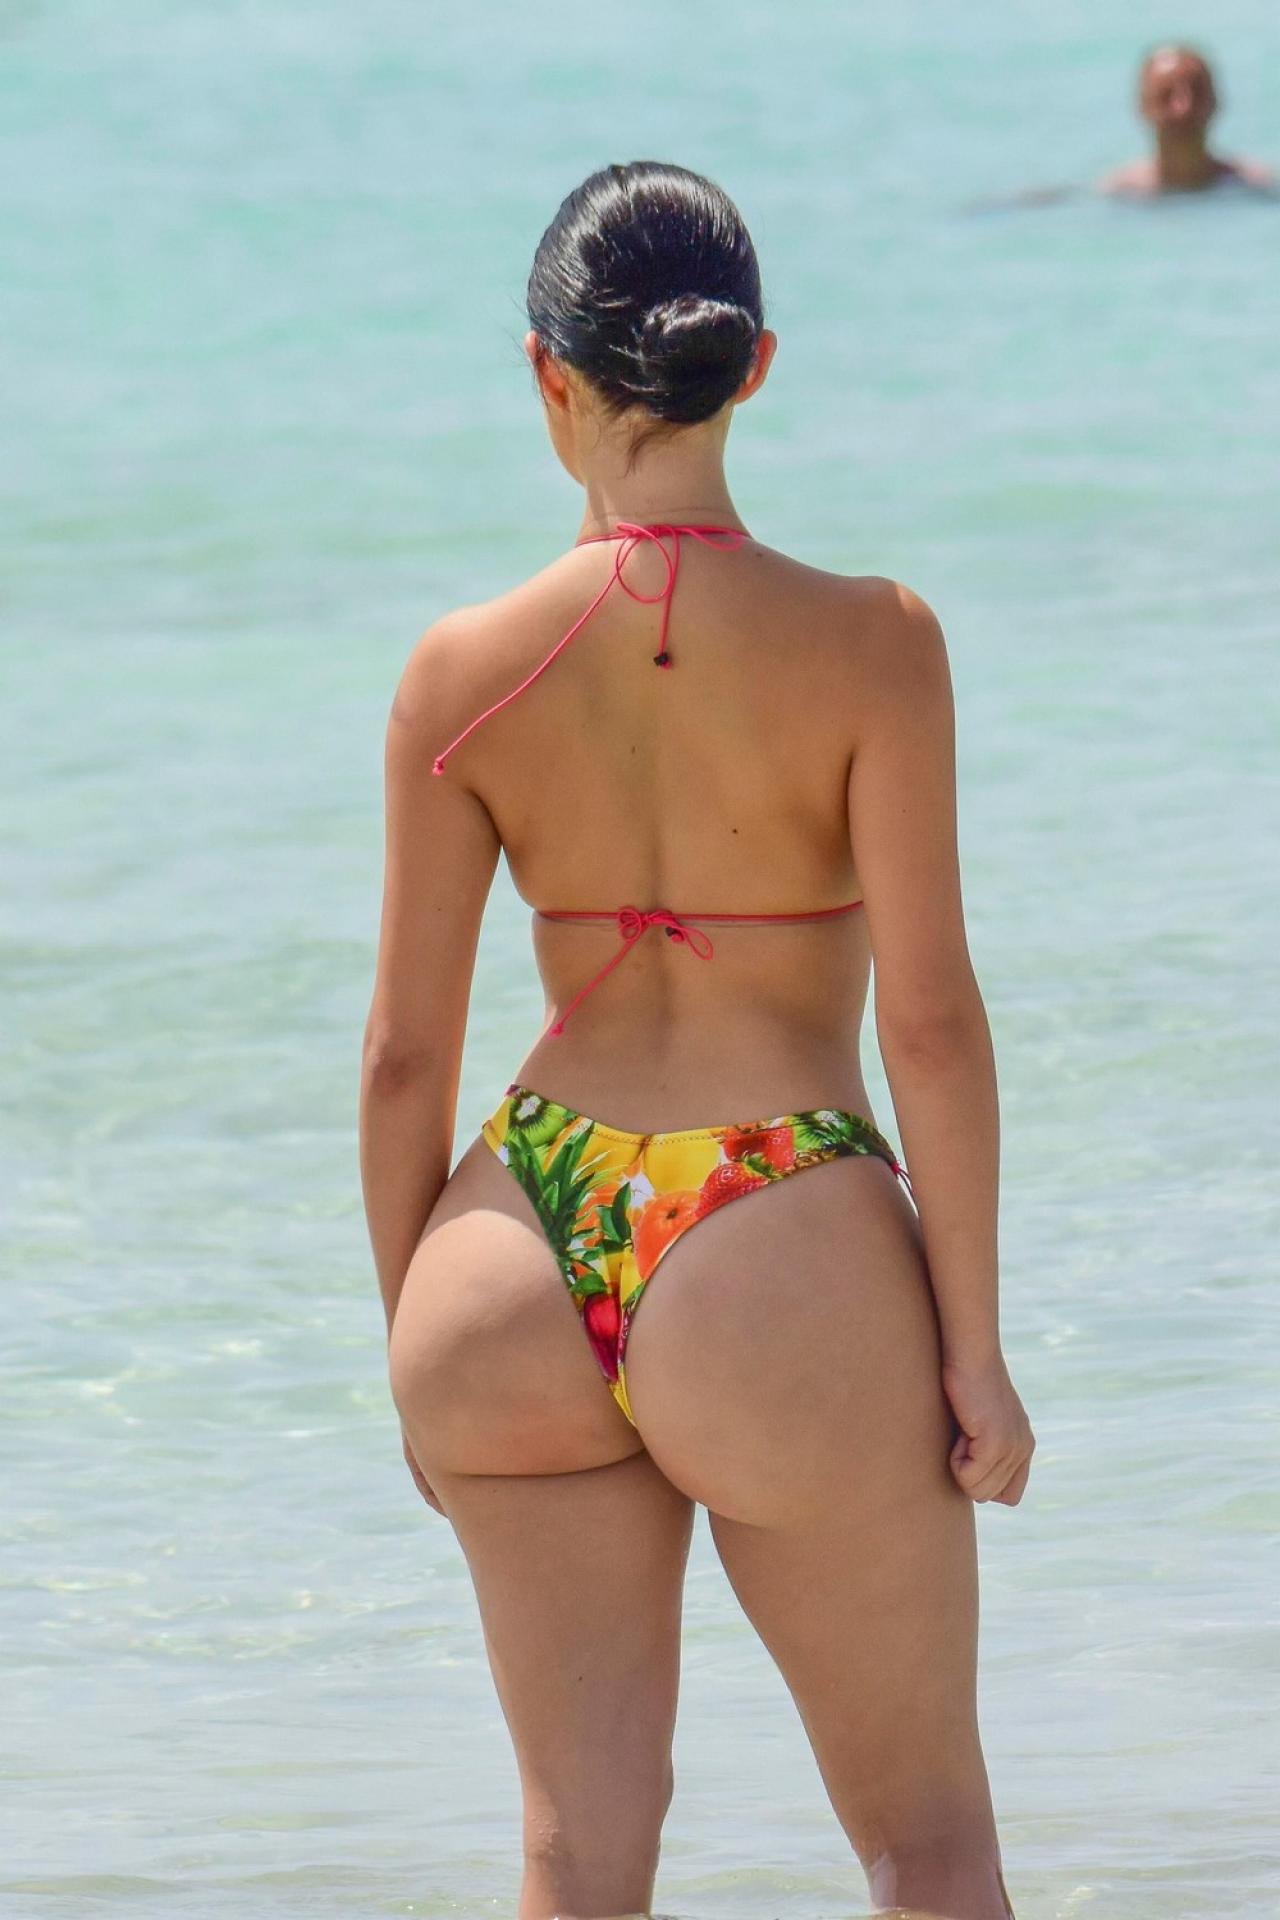 Красивые девушки в бикини на пляже (28 фото) 27